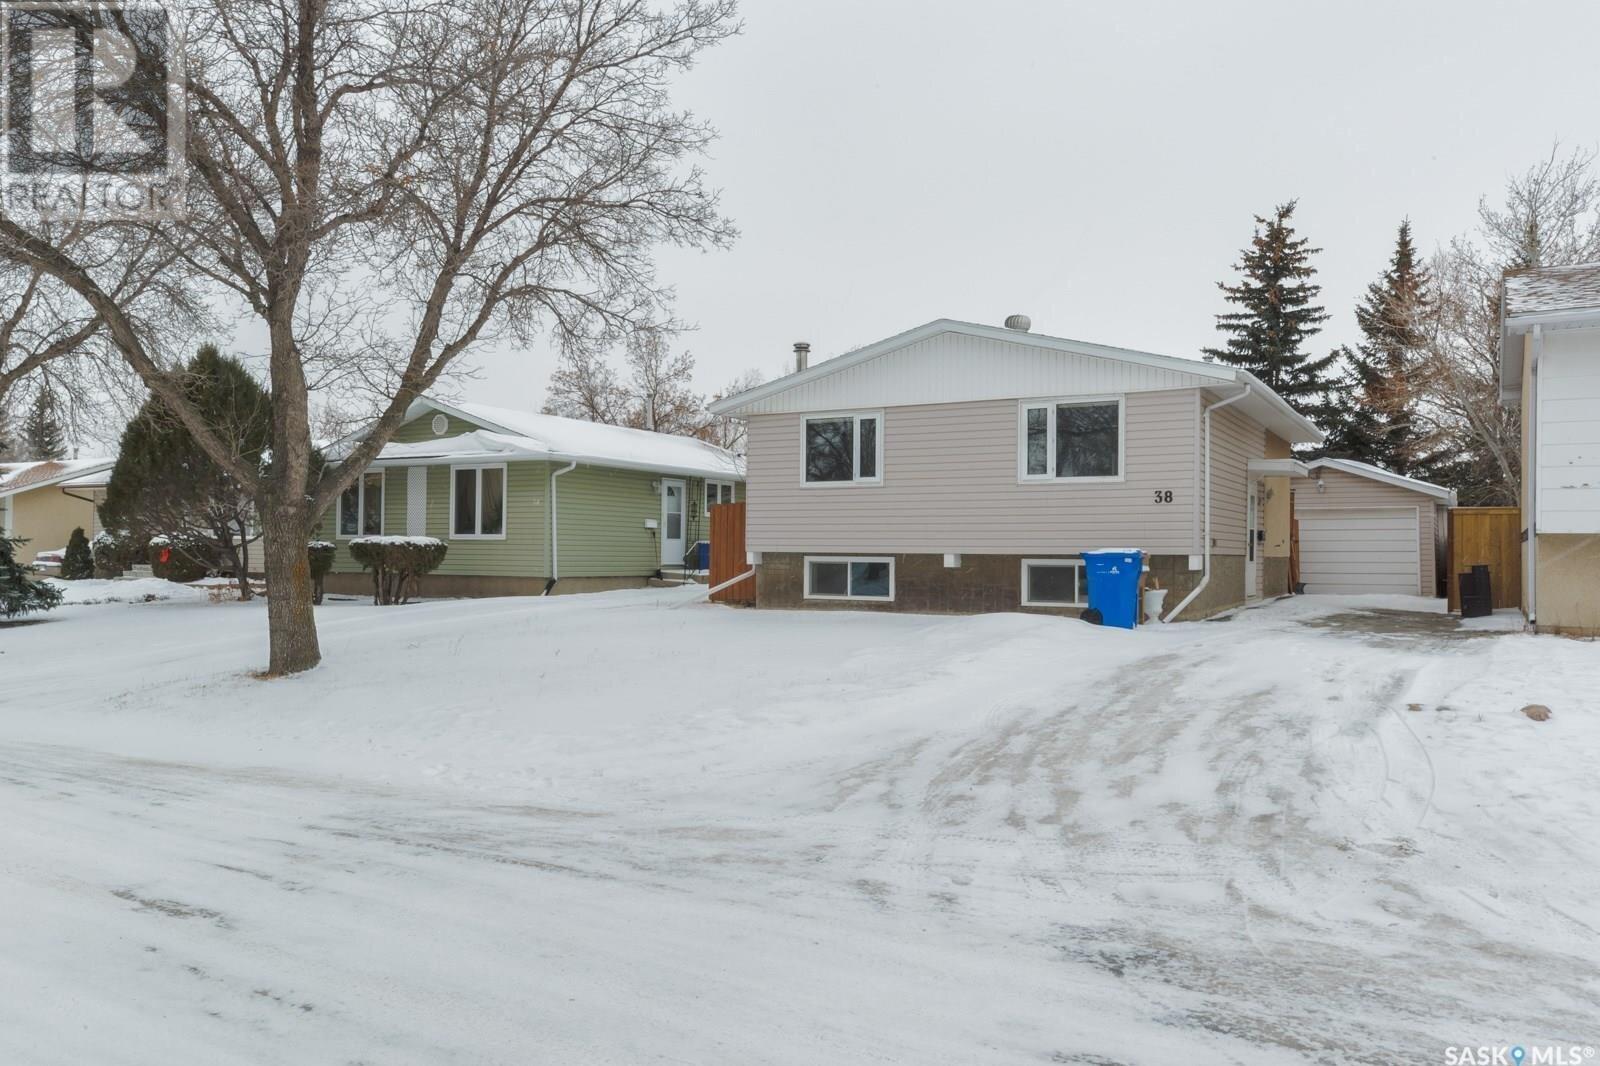 House for sale at 38 Thorn Cres Regina Saskatchewan - MLS: SK837506